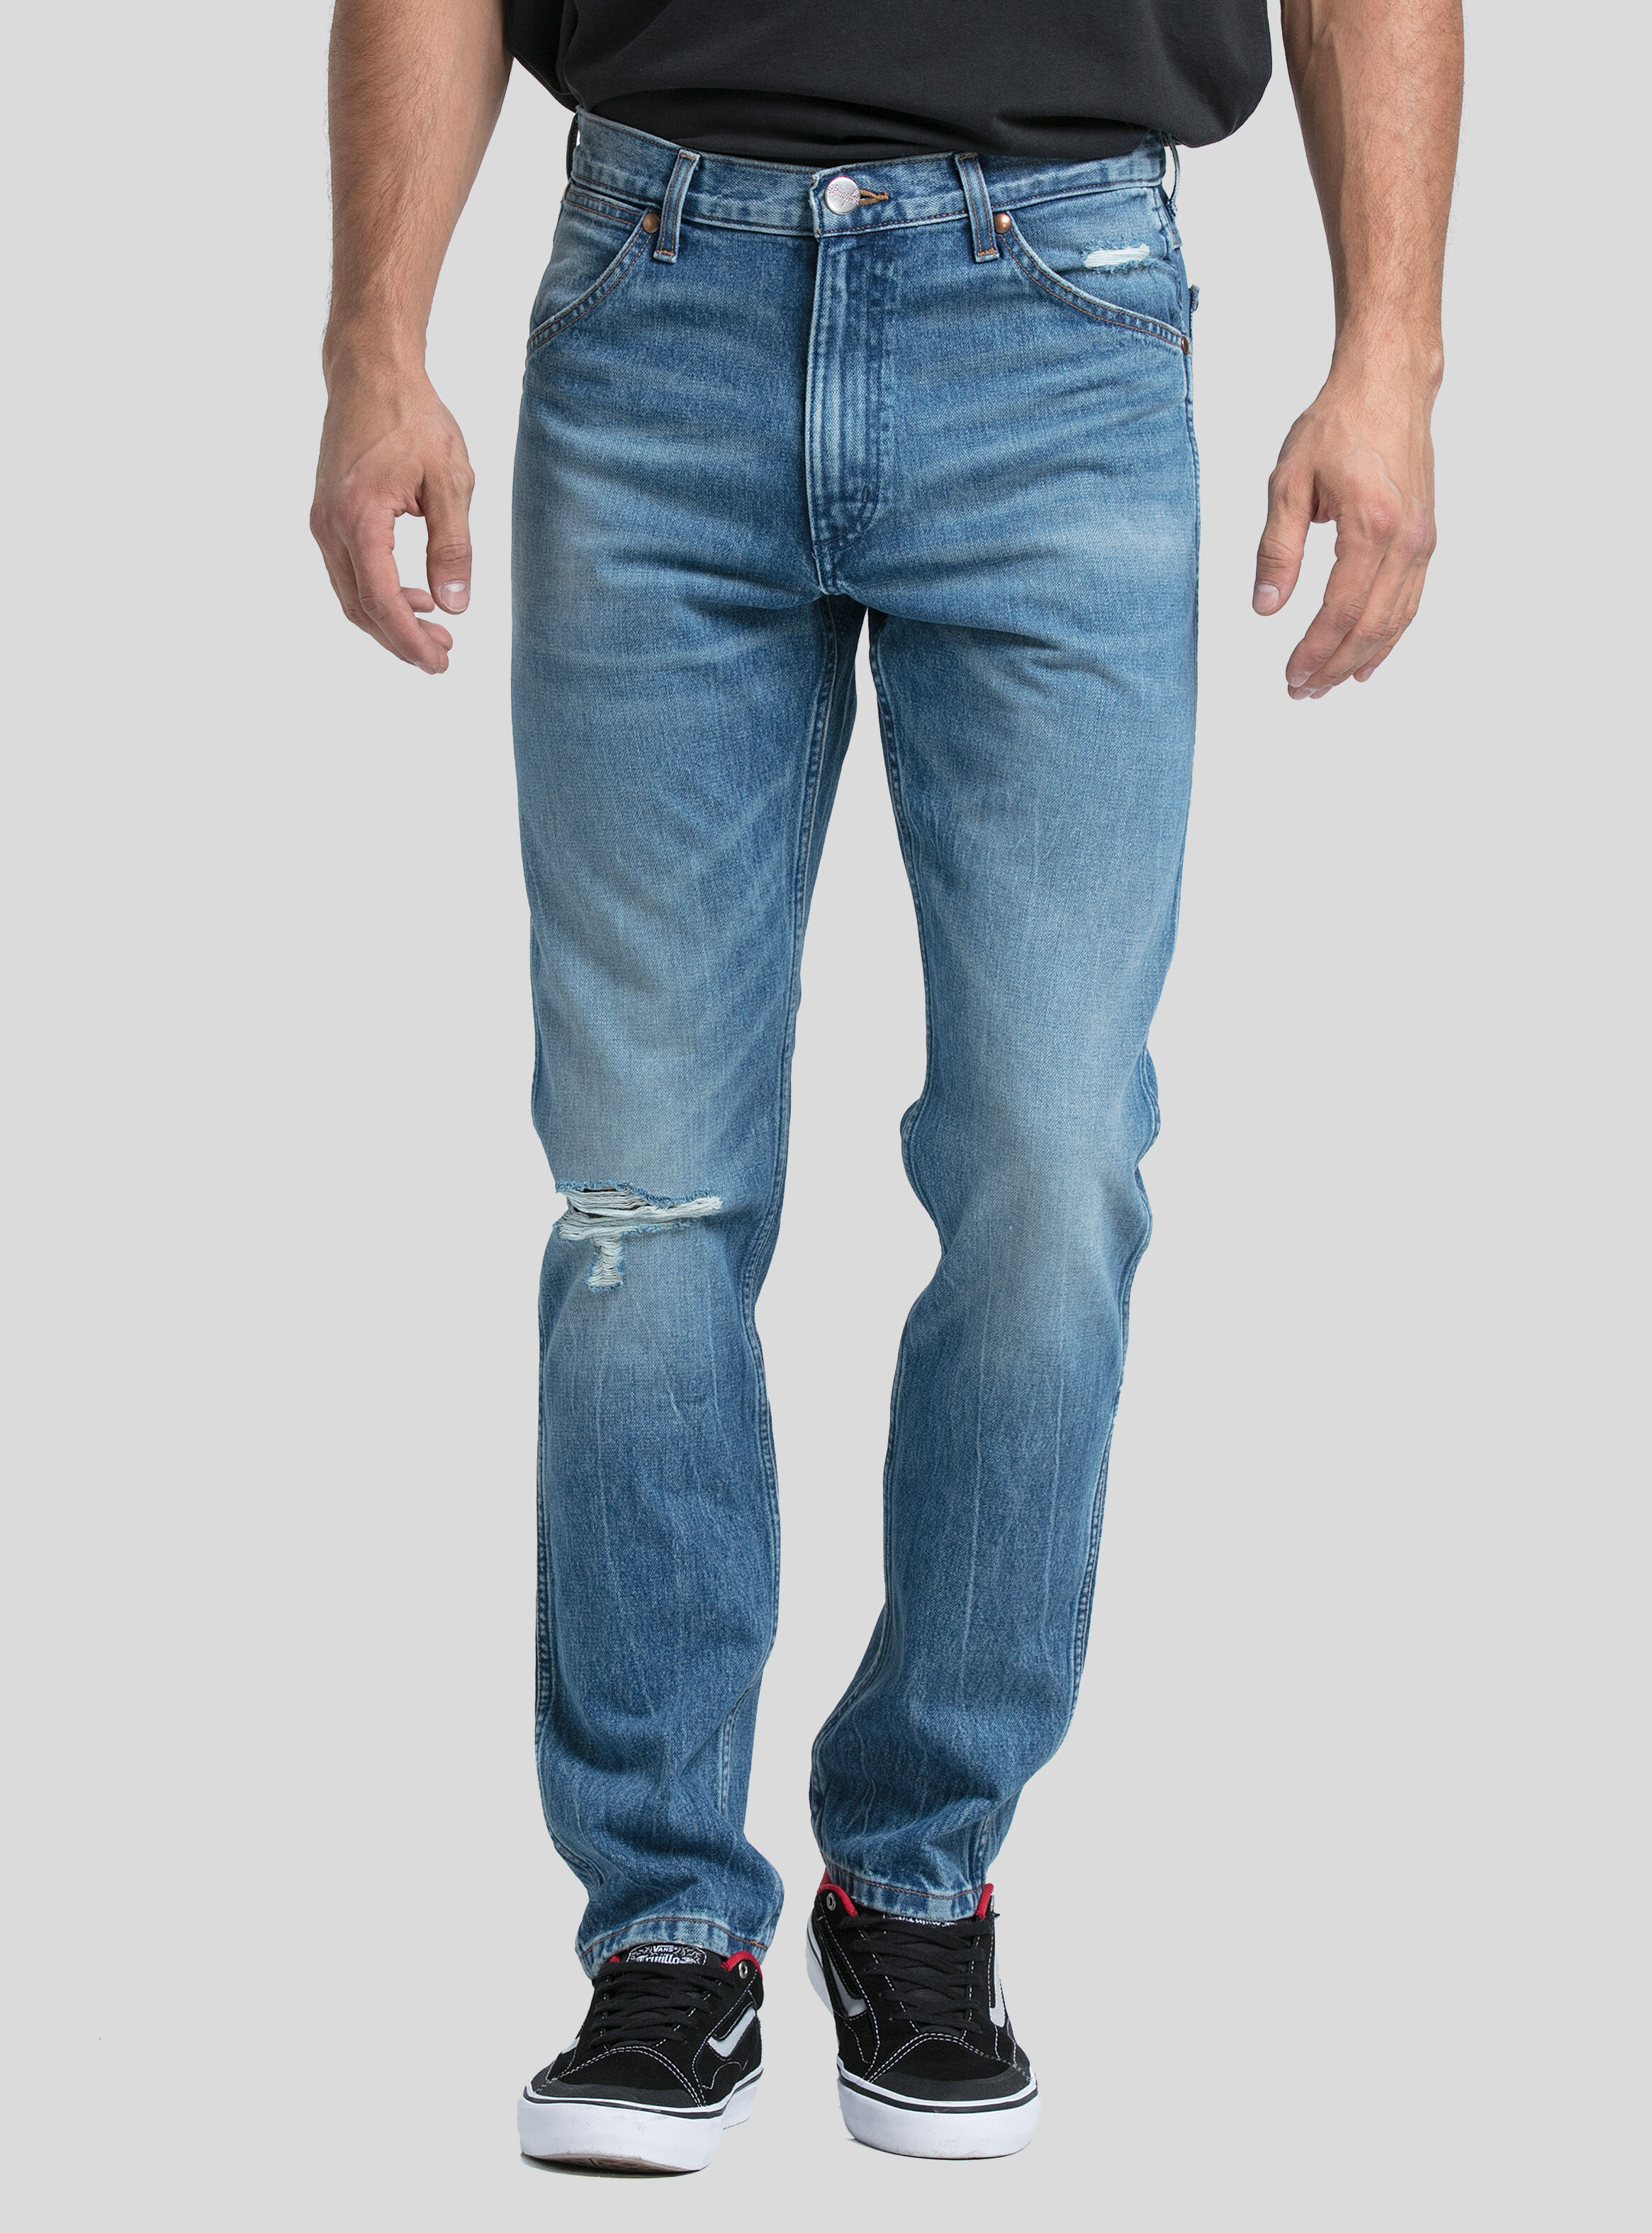 Icon Wrangler Jeans Azul Slim Fit CxBWdore